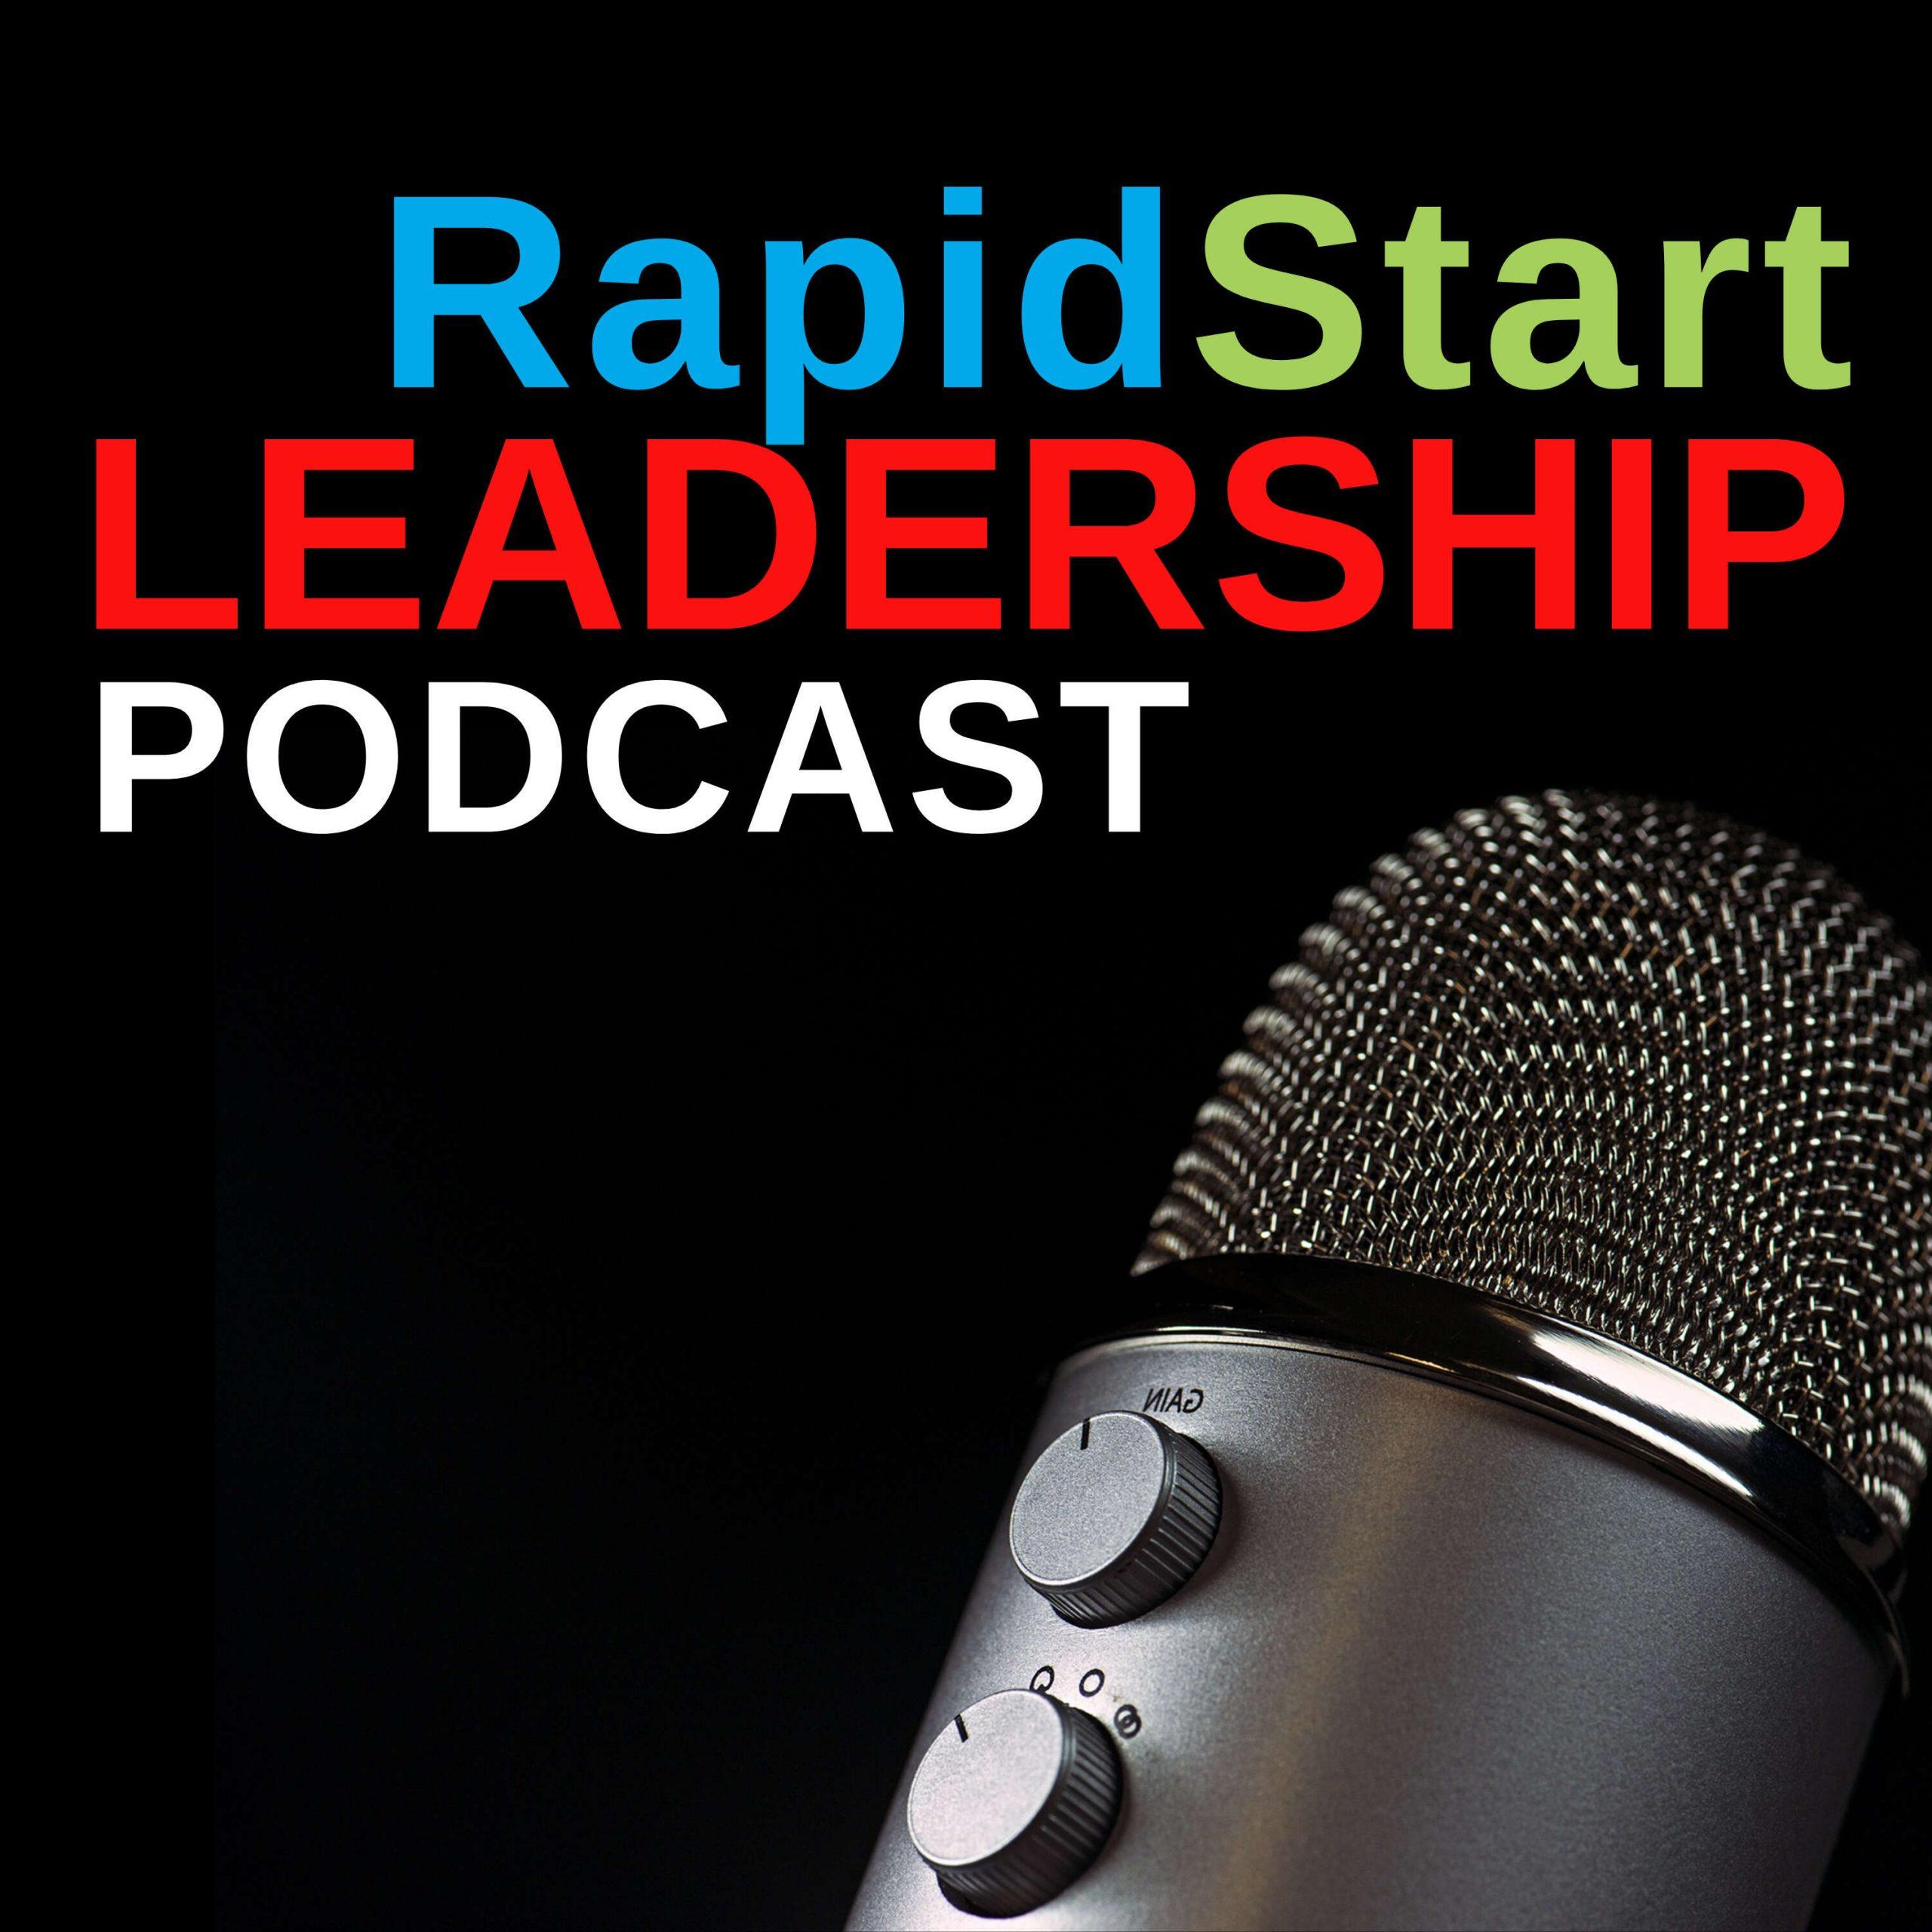 RapidStart Leadership Podcast